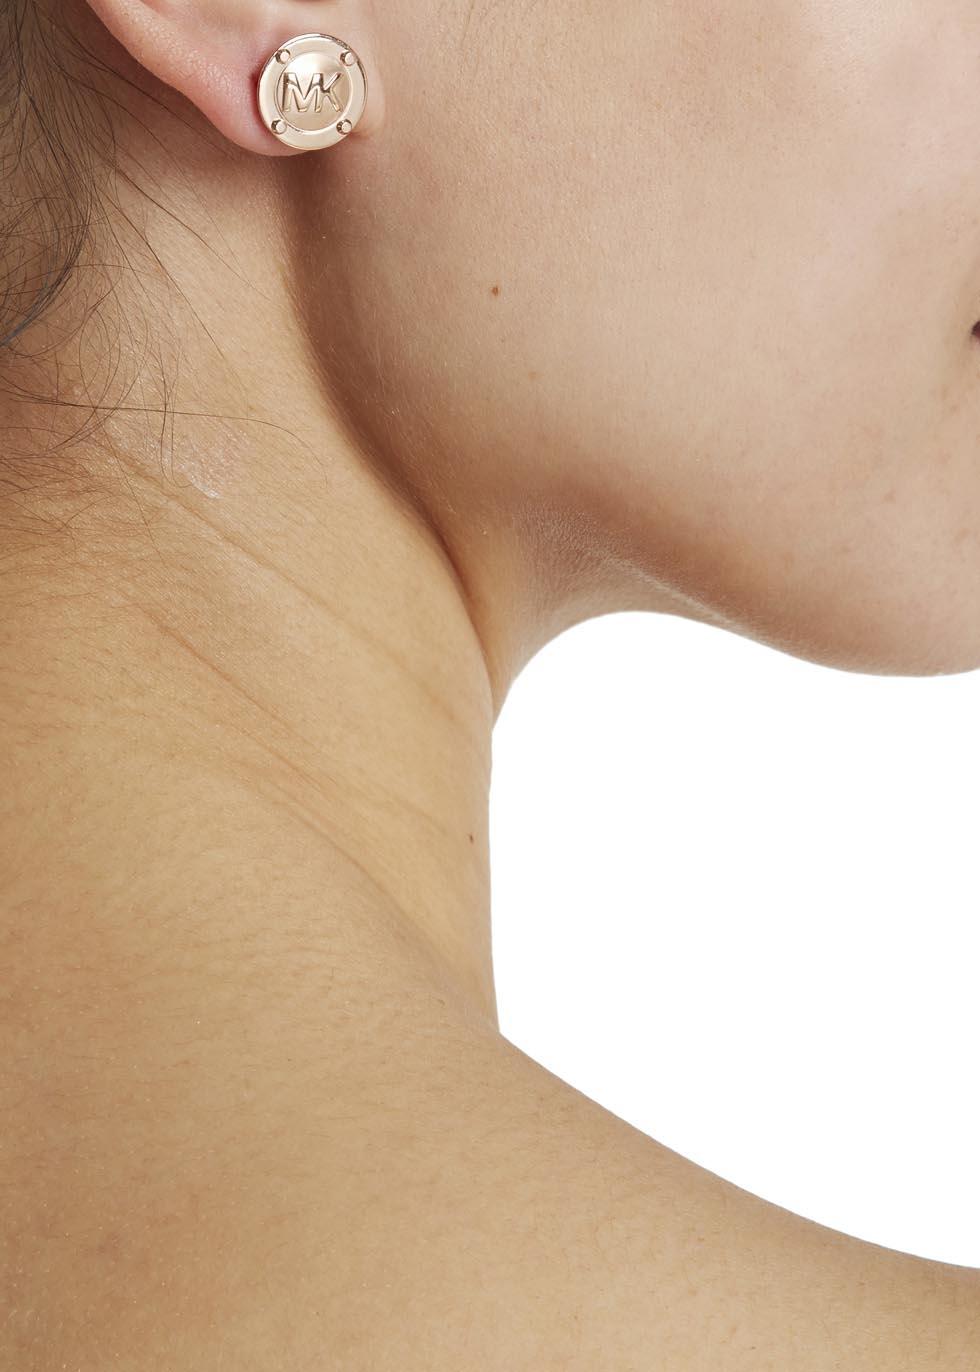 1d90e6a74b21 Michael Kors Rose Gold Tone Logo Stud Earrings in Metallic - Lyst